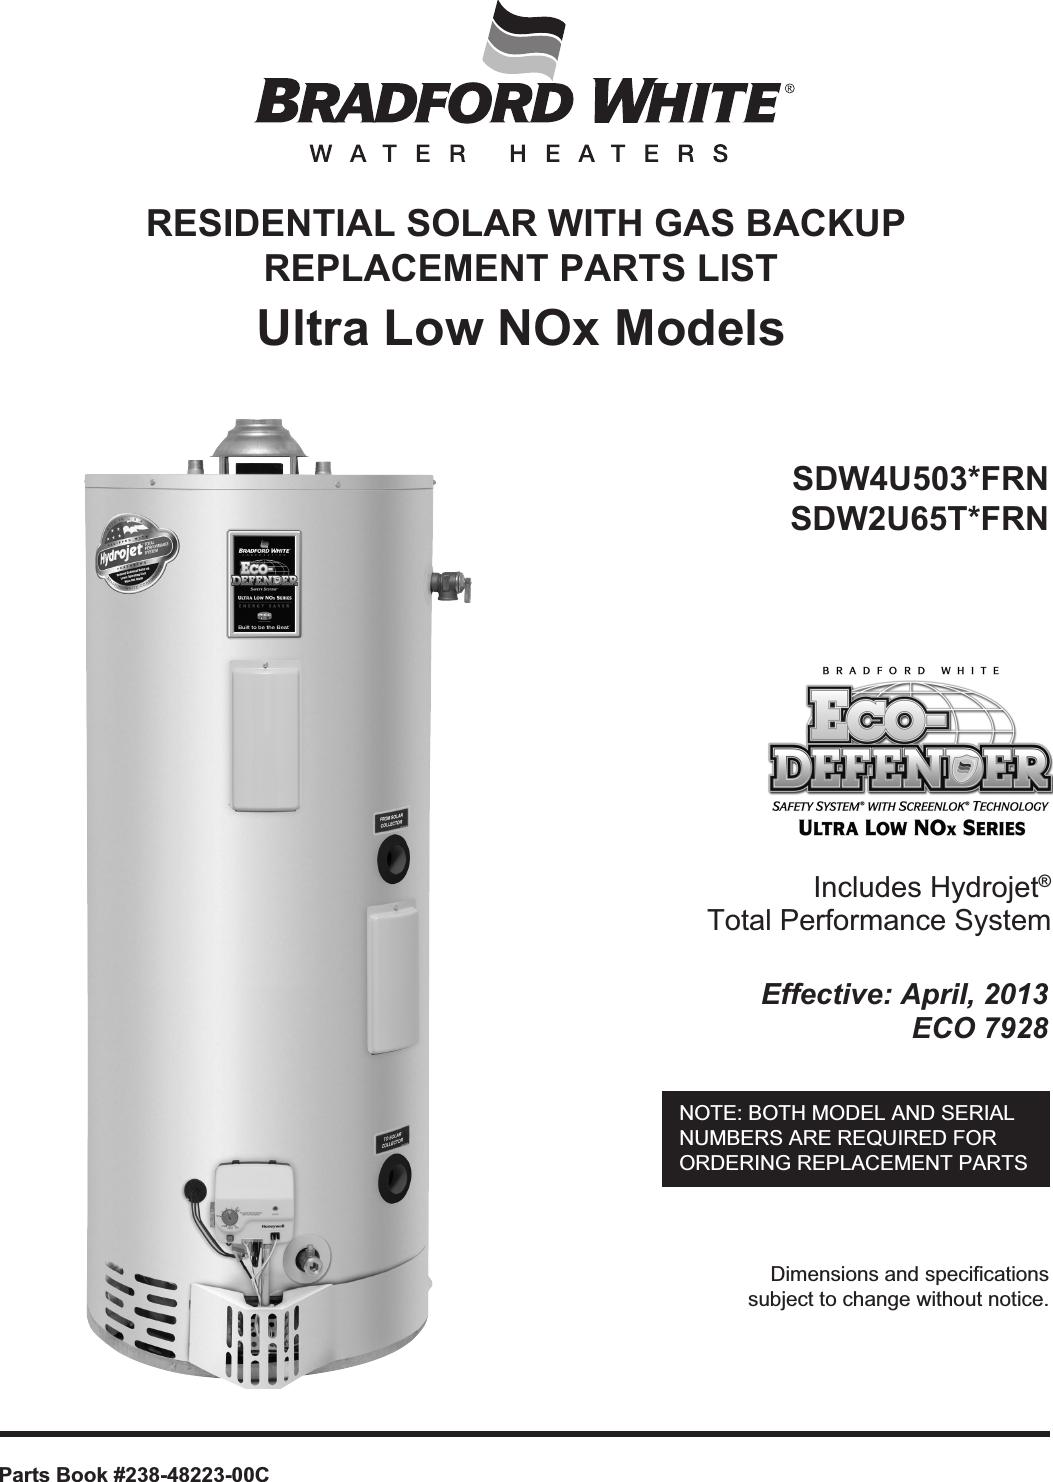 Bradfordwhite Residential Solar Ecostor2 Sc Indirect Single Coil Eco Bradford White Water Heater Wiring Diagram Defender Gas Backup S Dw4 U Partslist 48223 31864 48223c Parts List User Manual